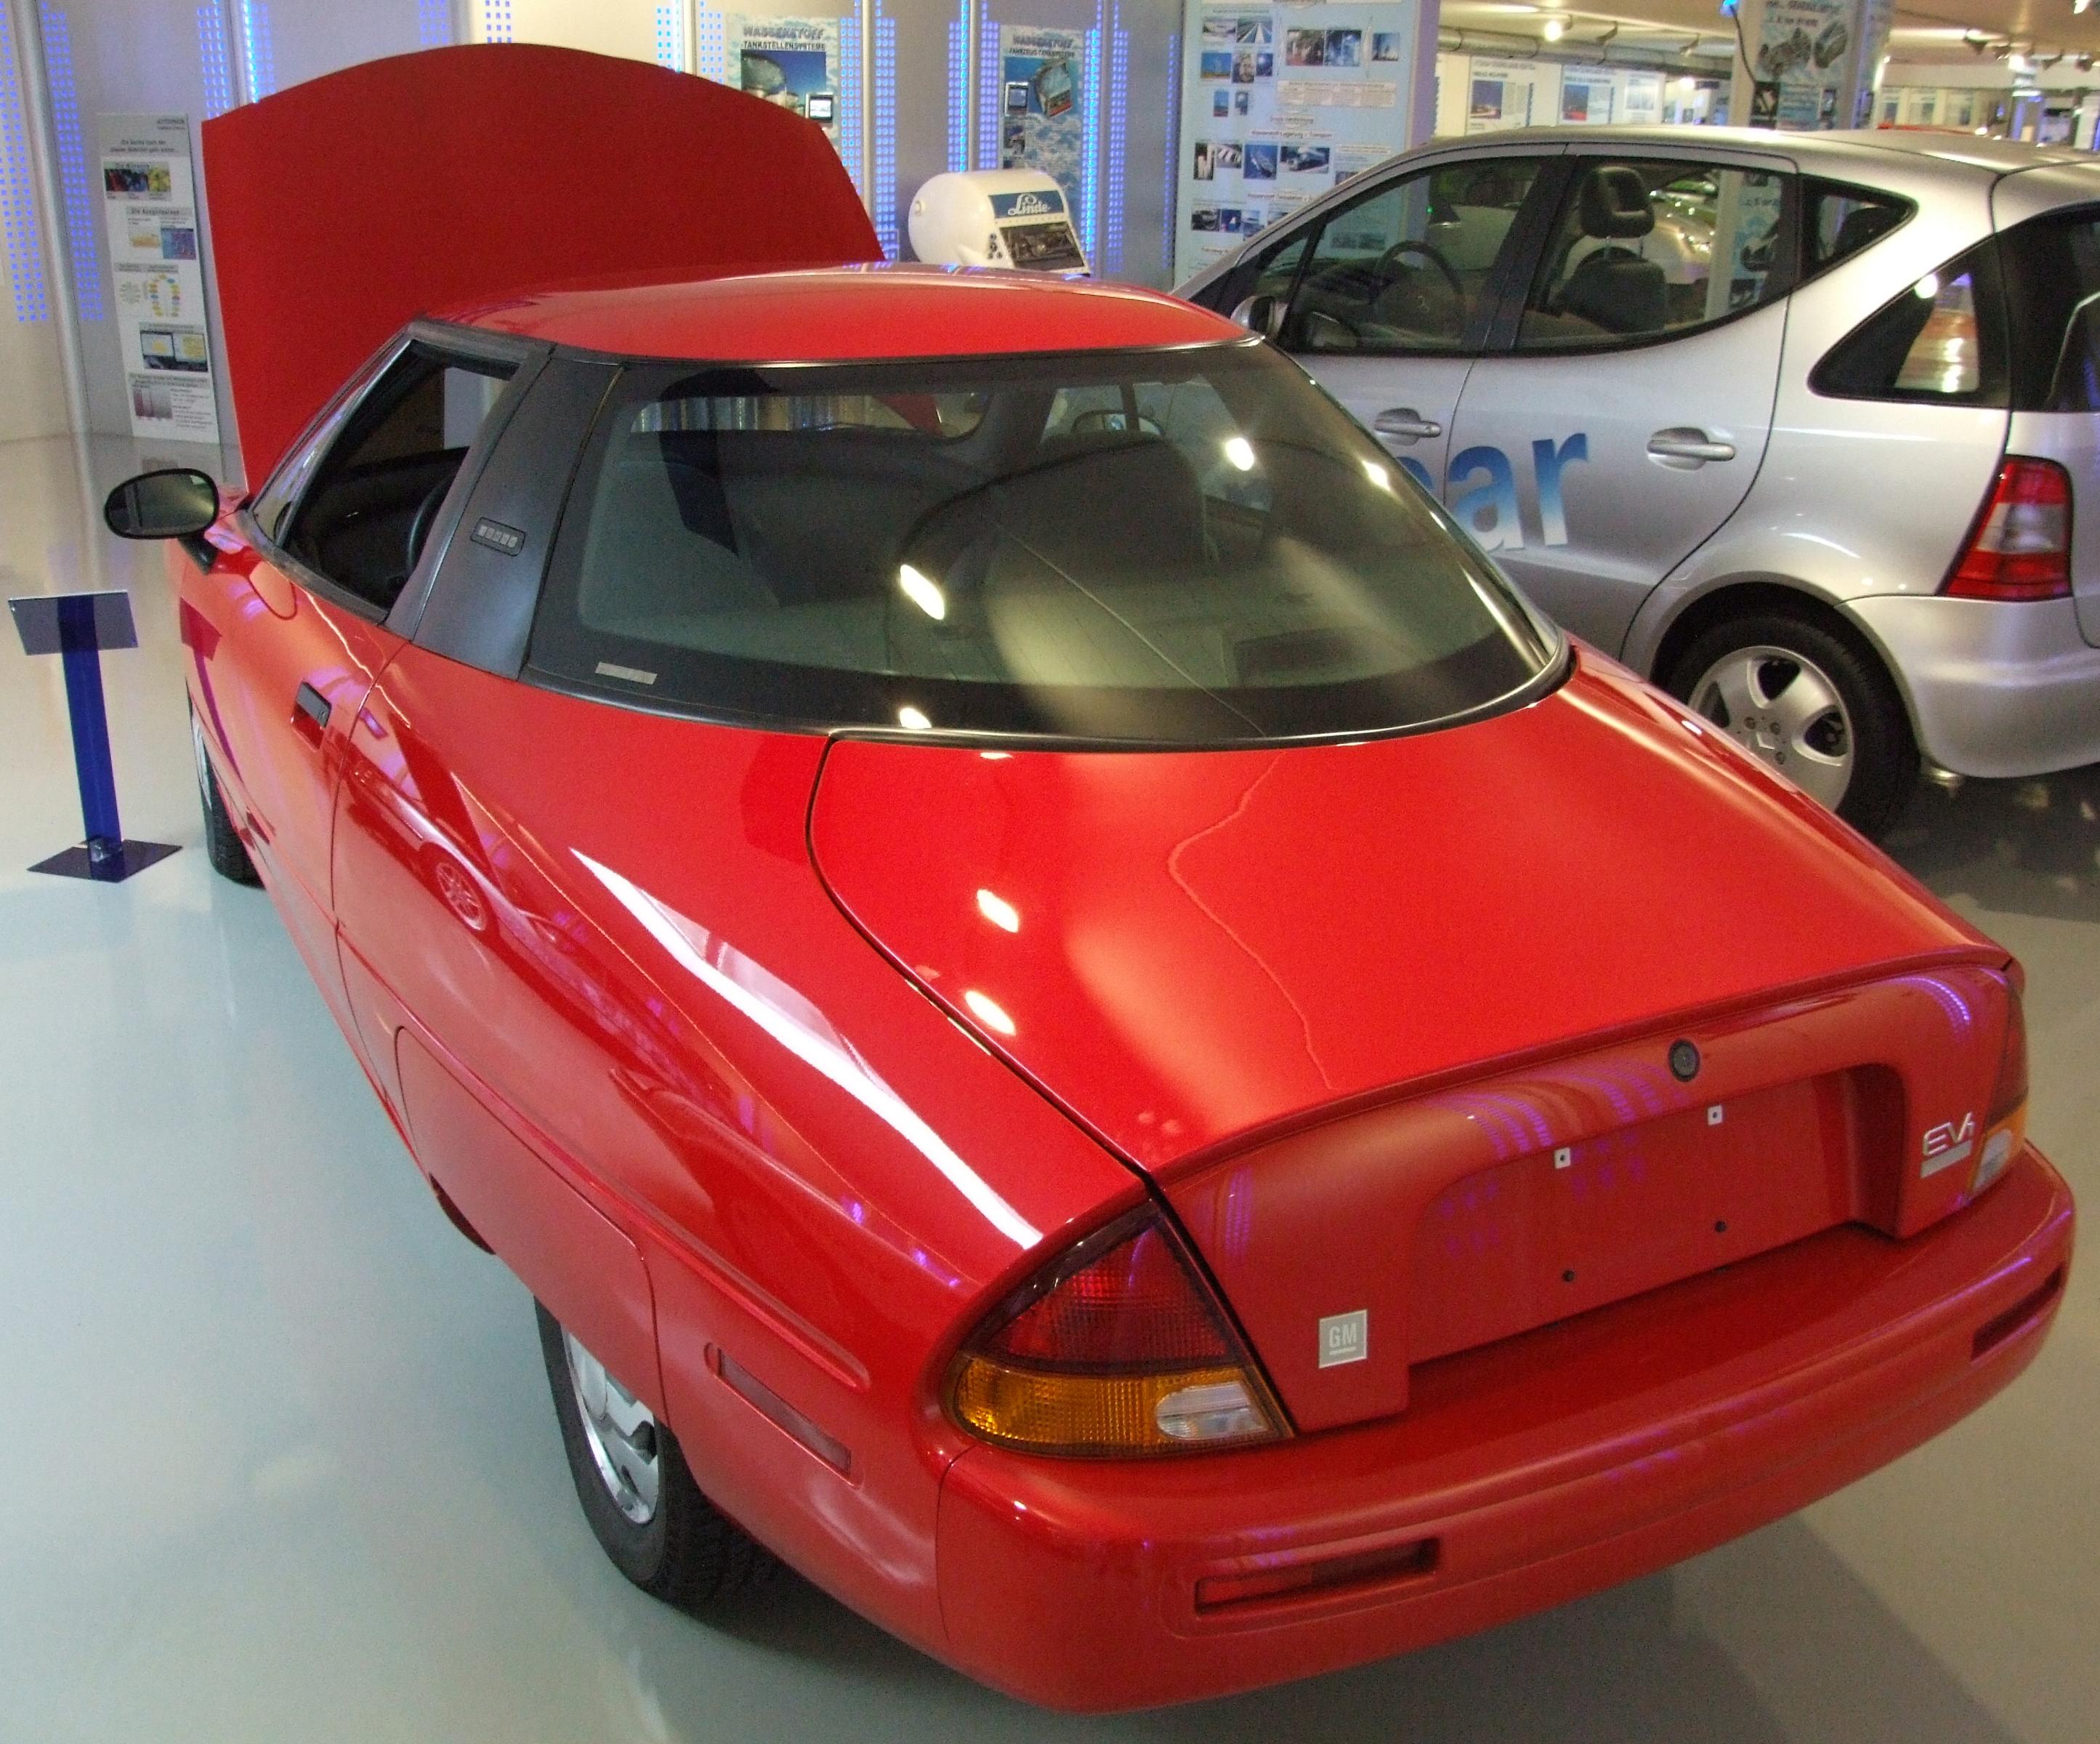 File:General Motors EV1 Rückansicht.jpg - Wikimedia Commons